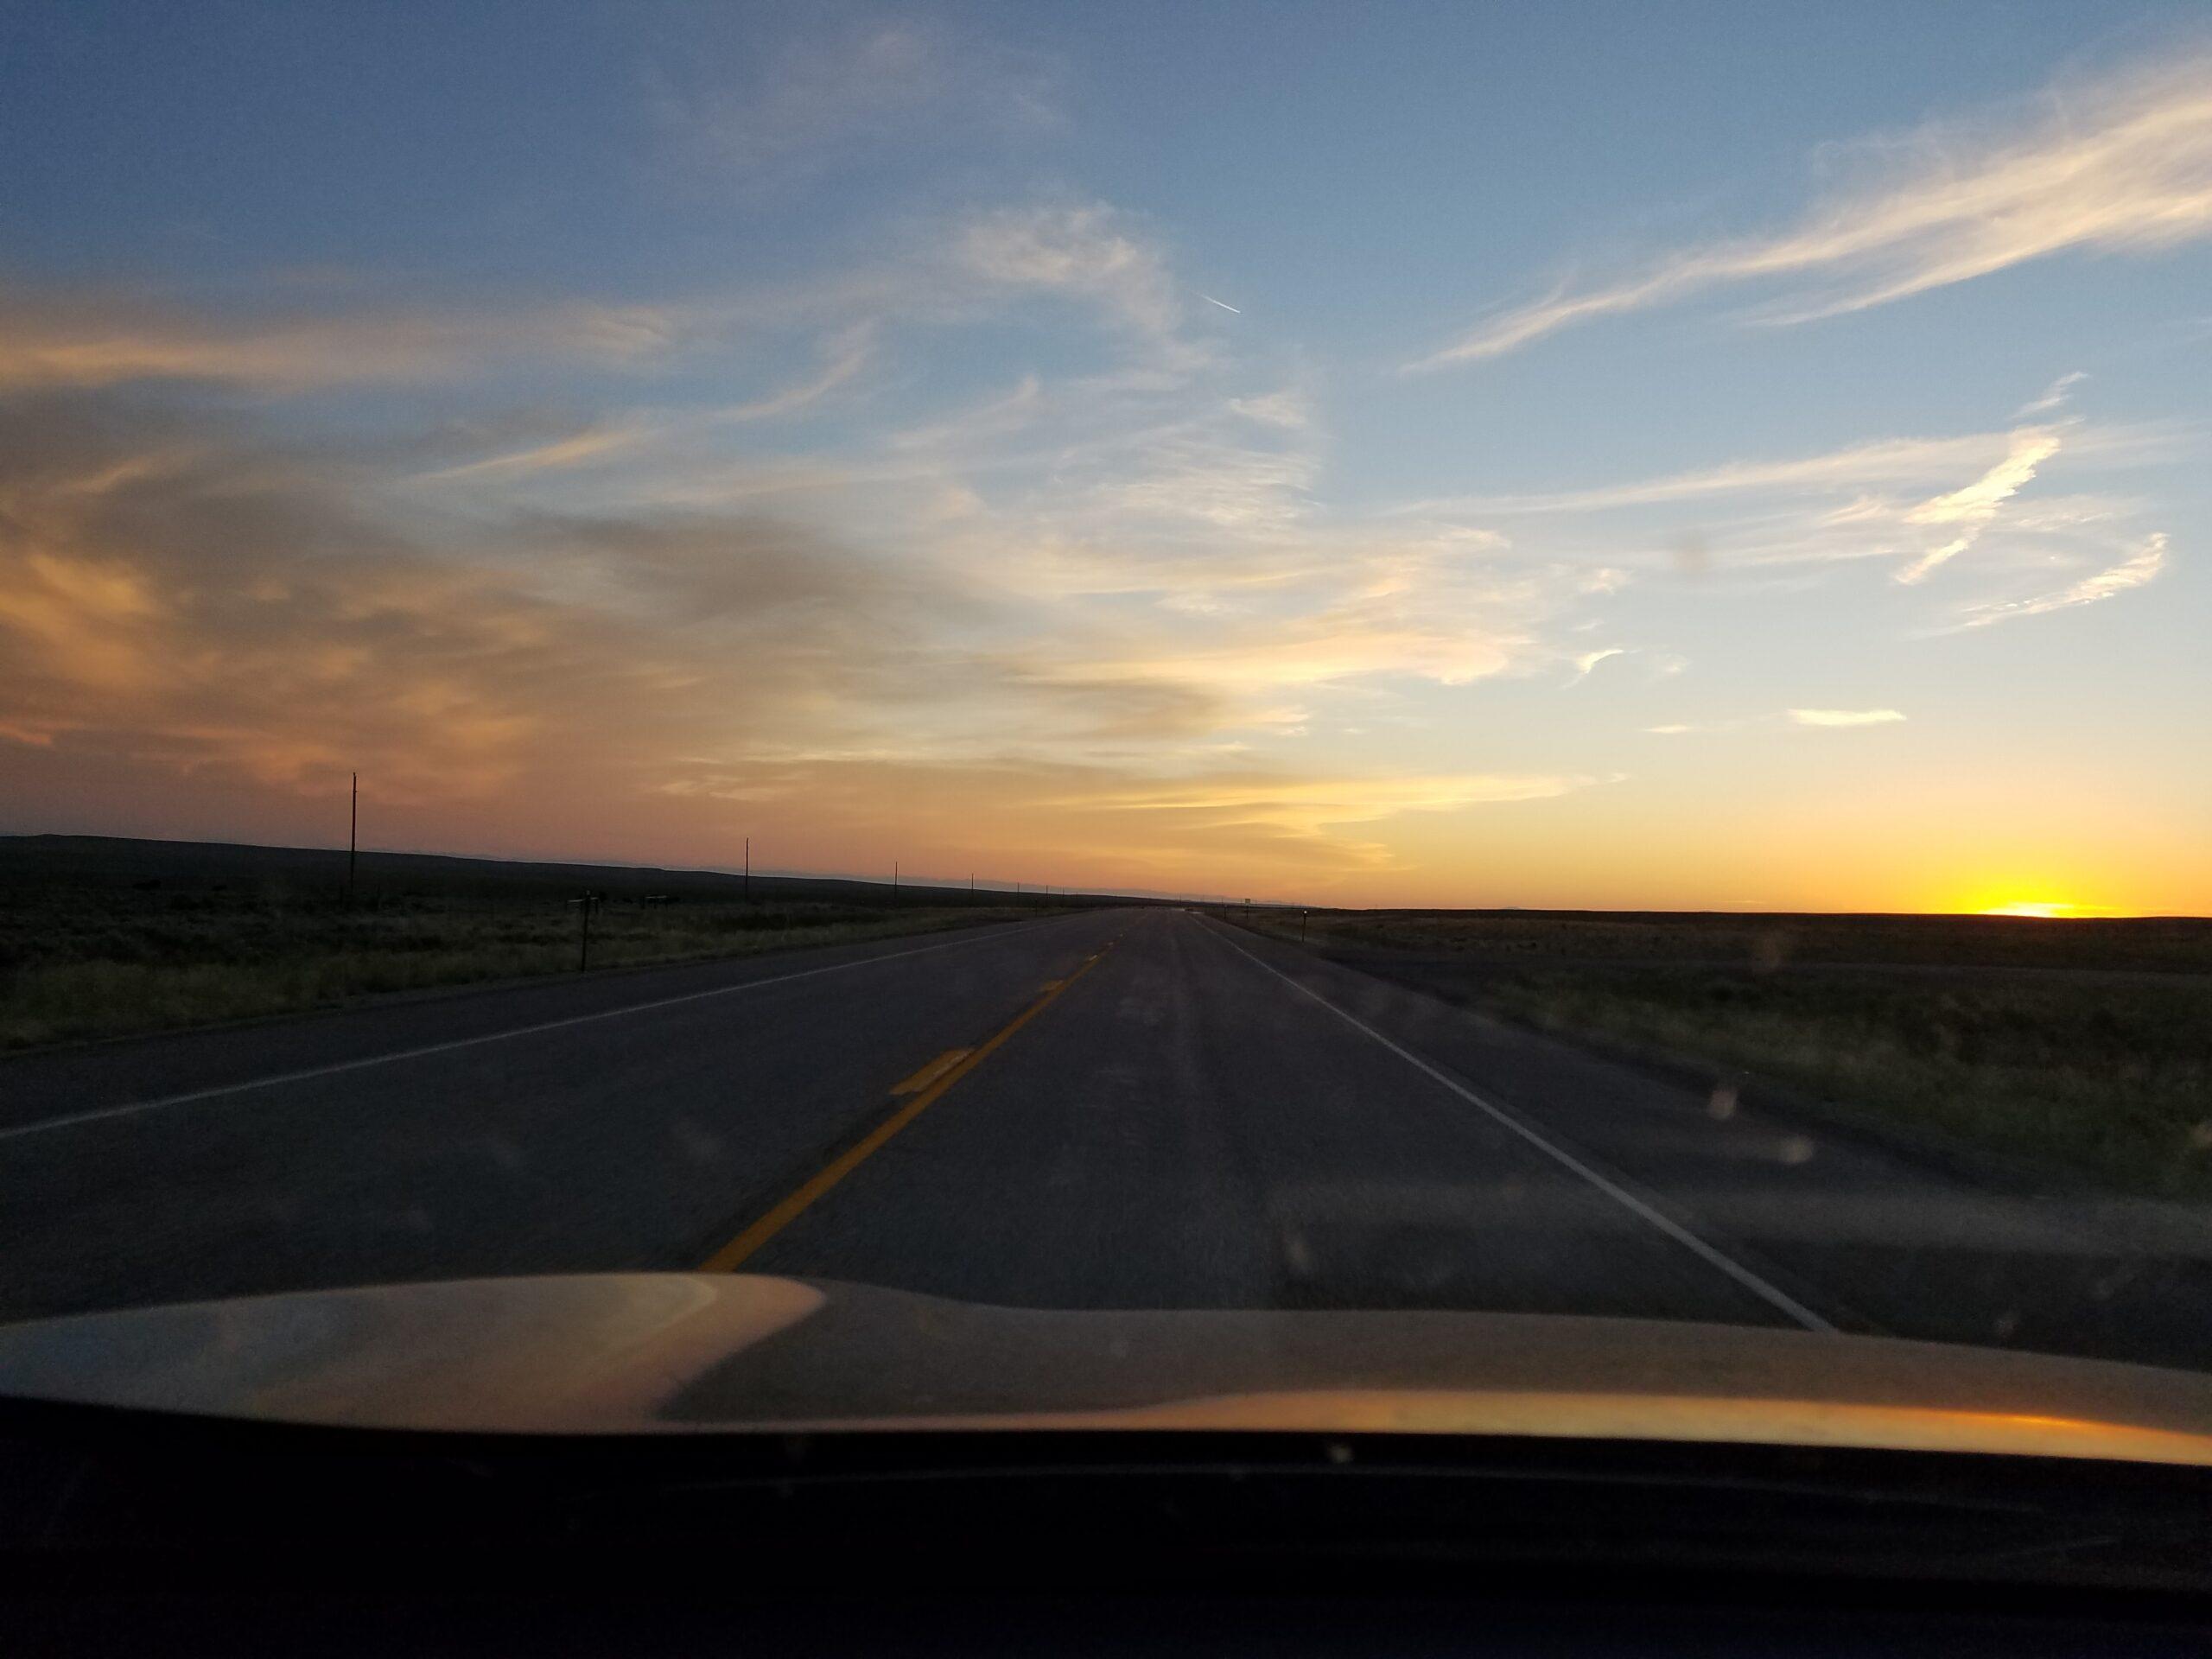 sunset-driving